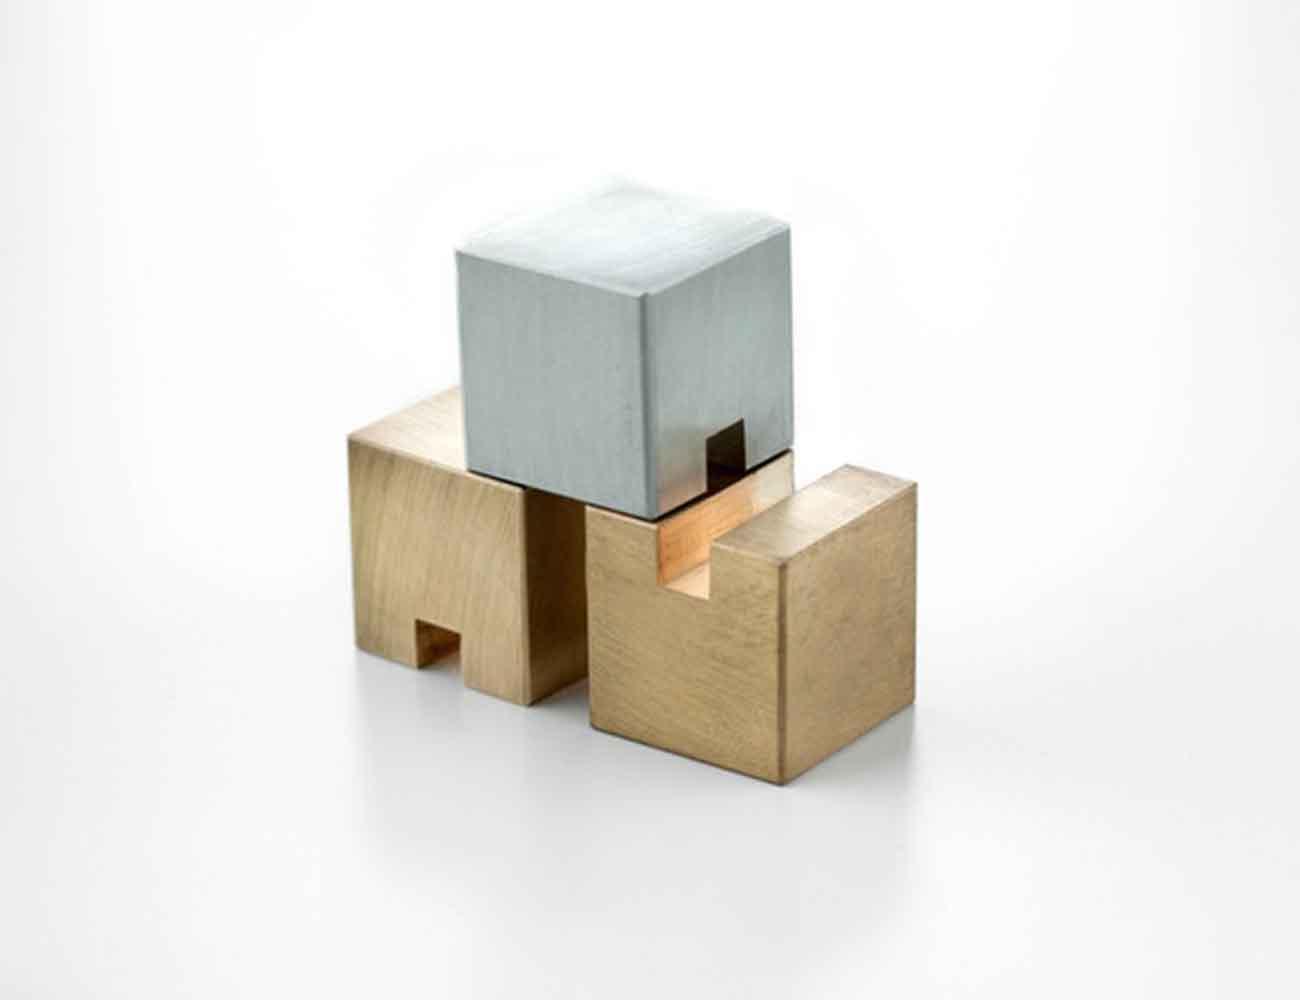 Phenomenal Stacks Metal Cube Desk Accessories Desk Organizer Home Interior And Landscaping Ferensignezvosmurscom